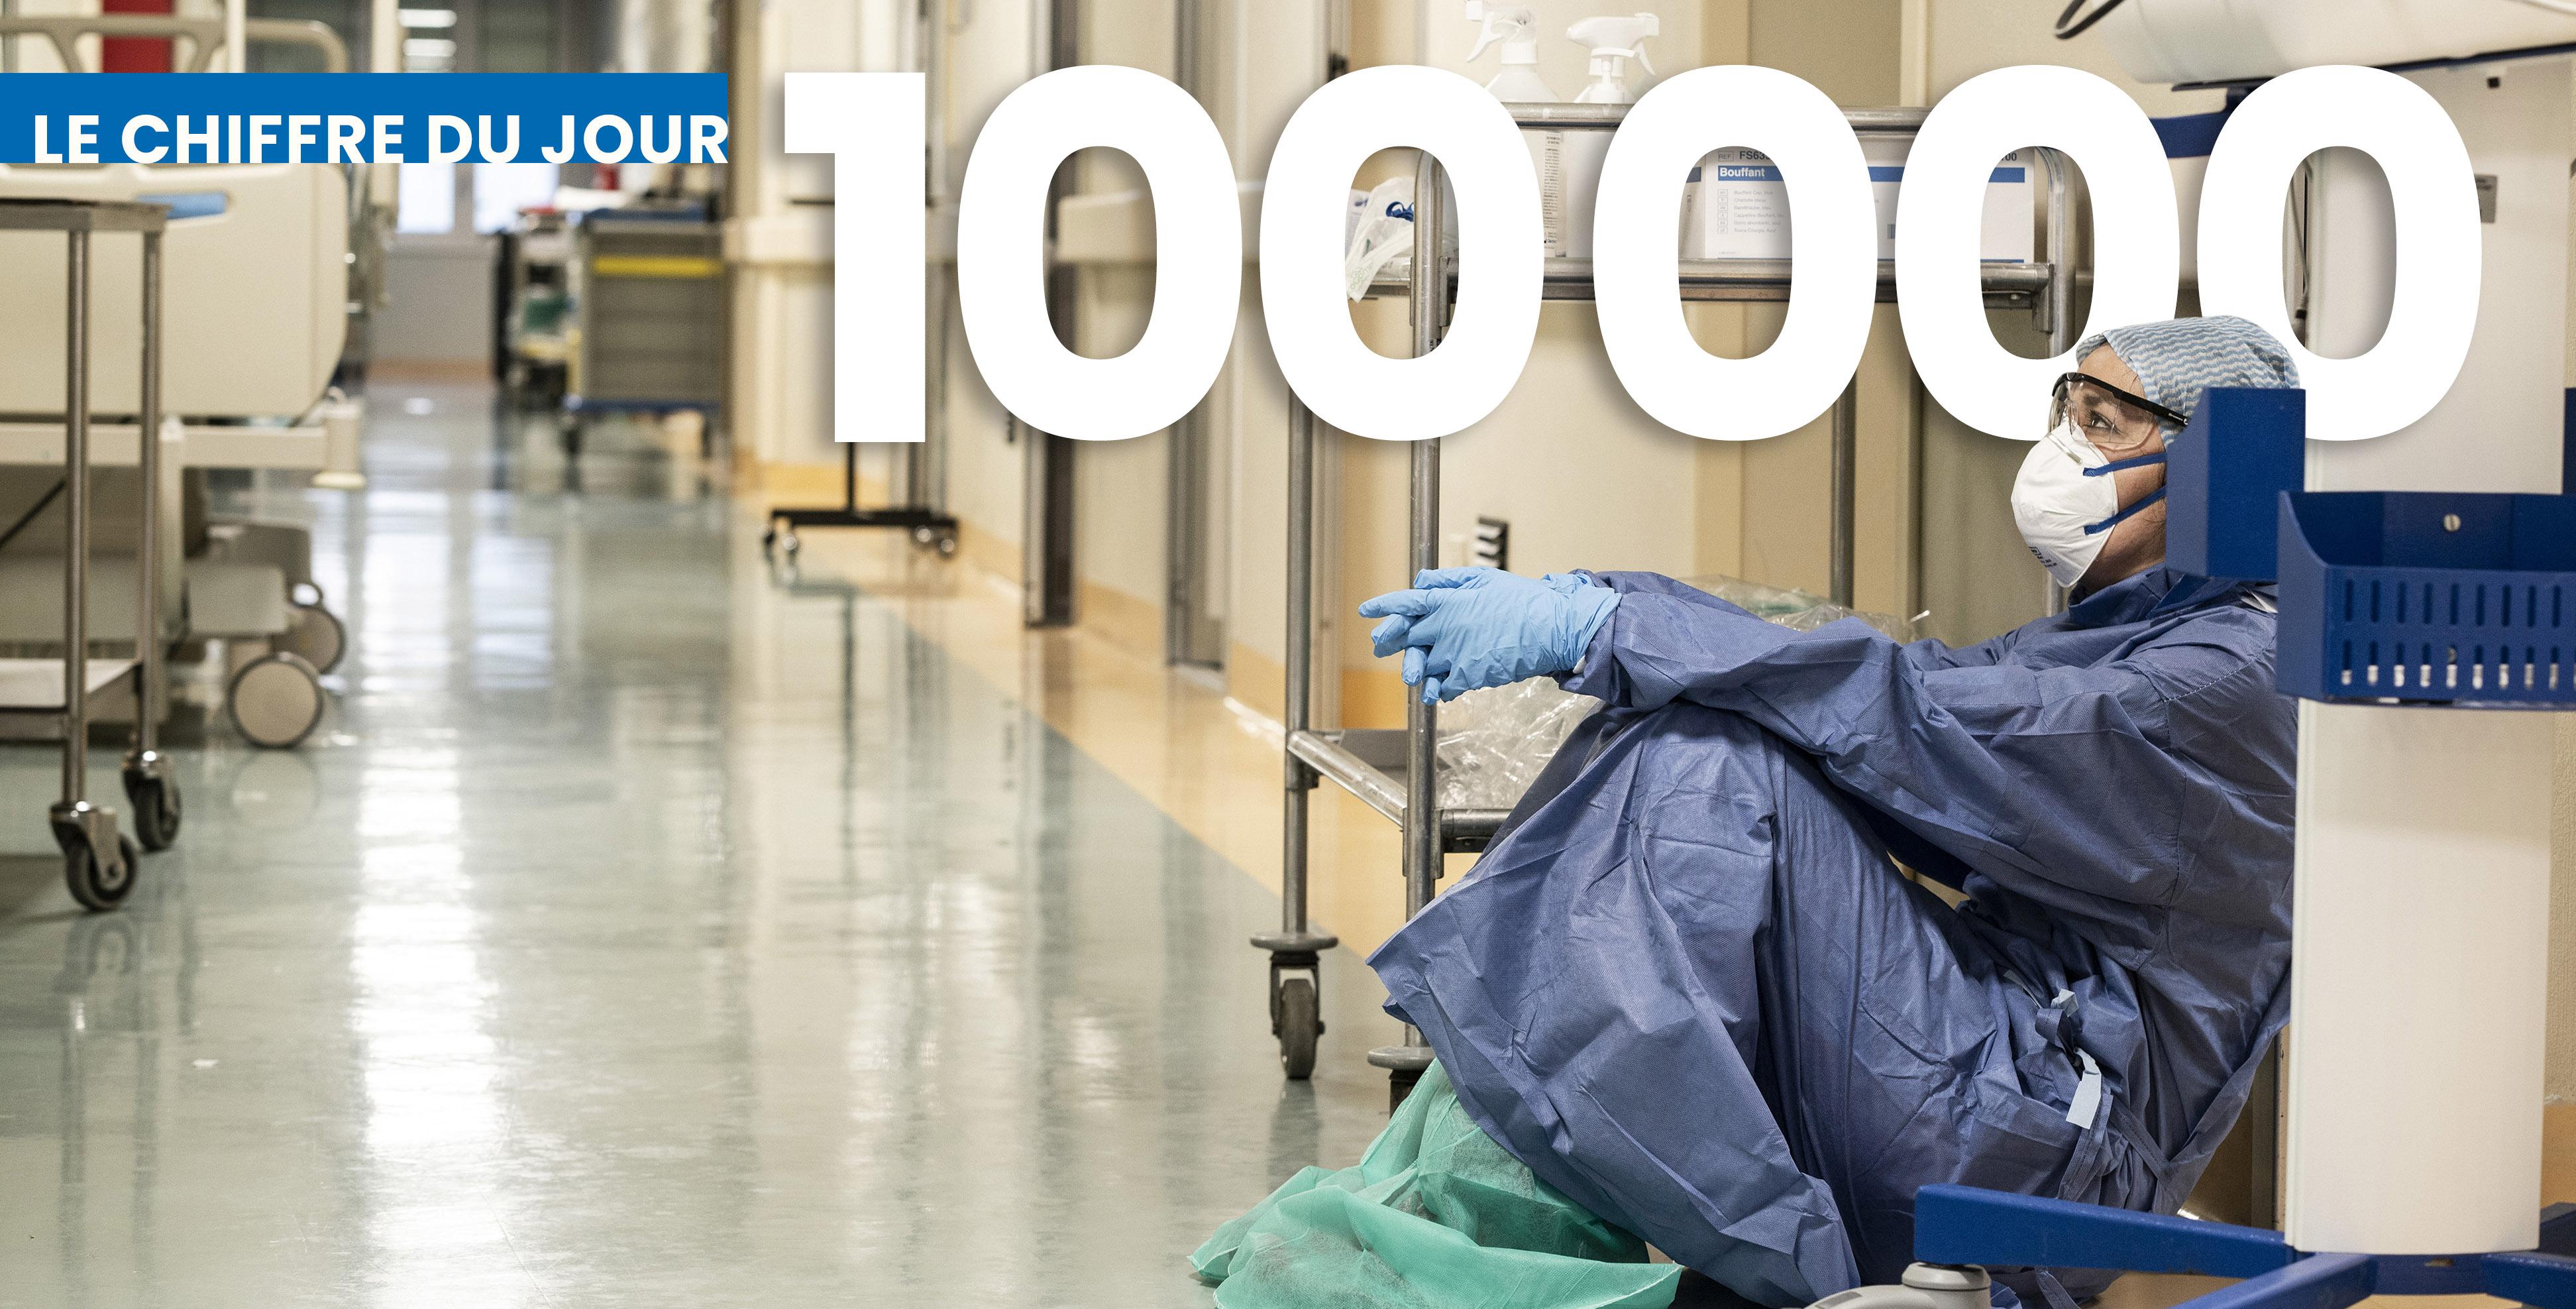 Une infirmière épuisée de l'hôpital San Salvatore, à Pesaro en Italie © A. Giuliani